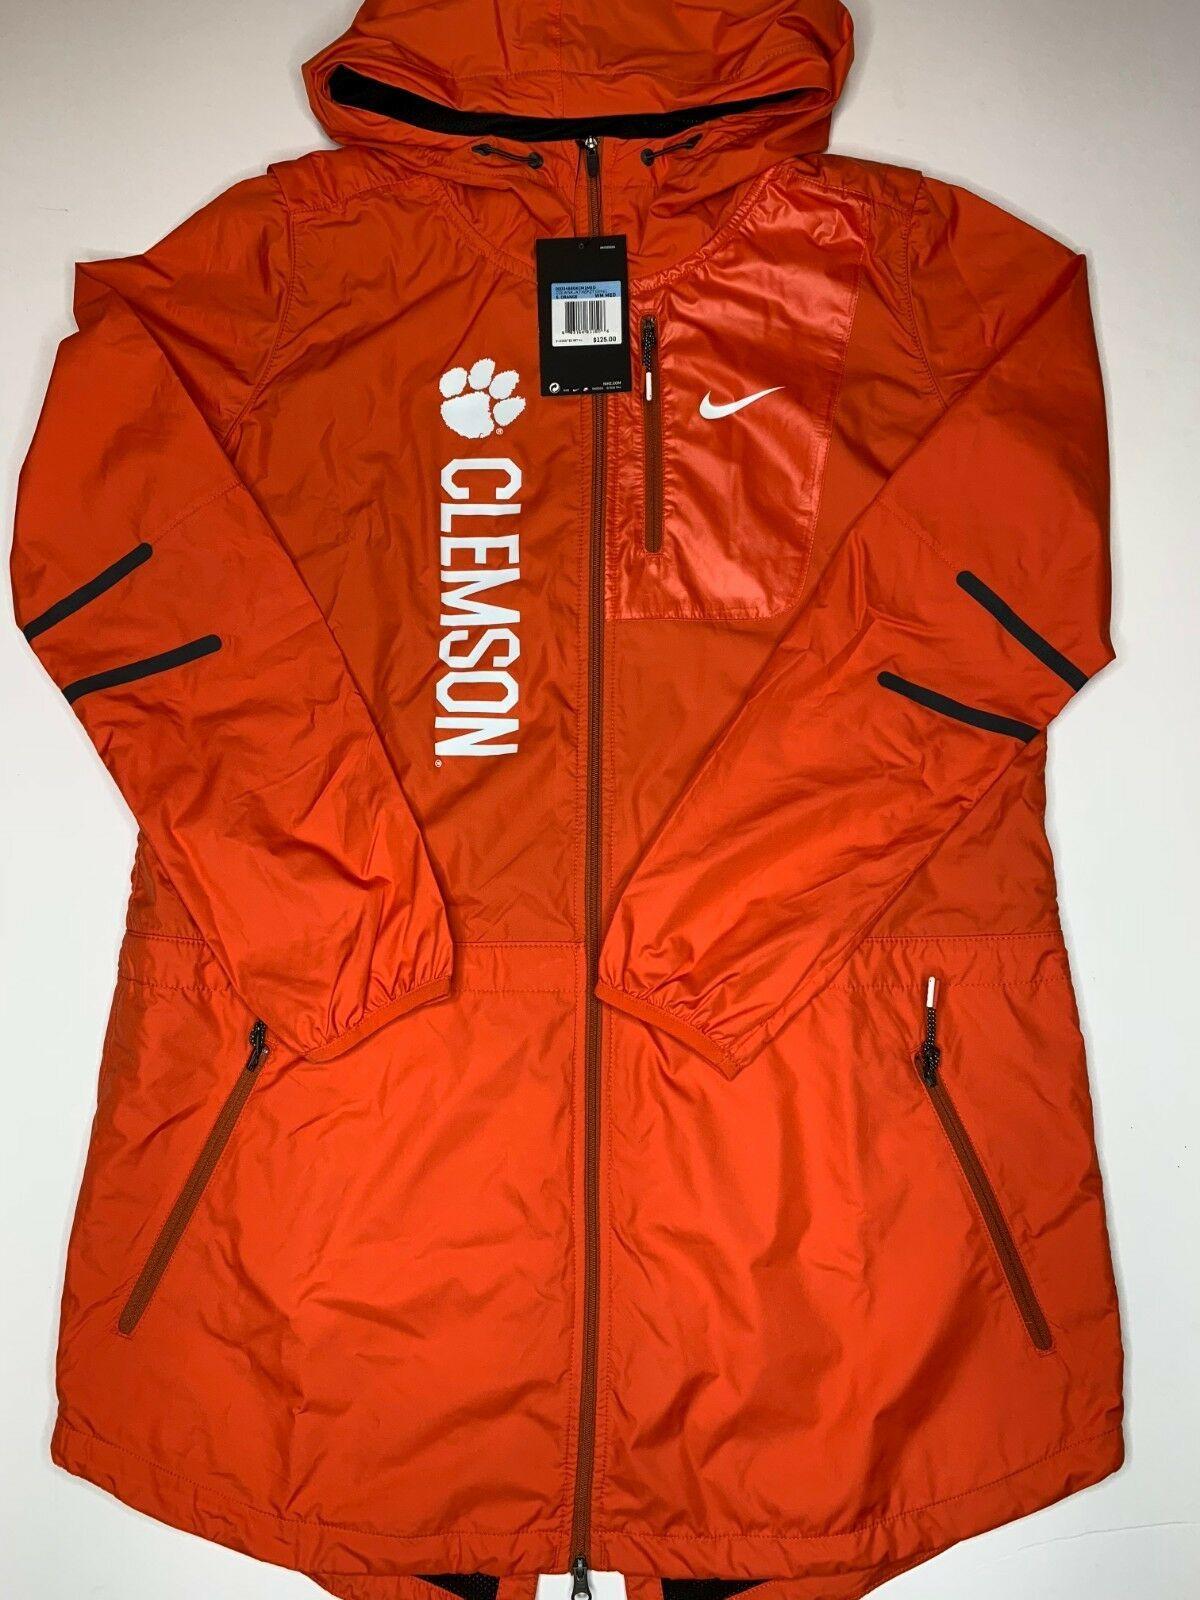 cd7abe8fe495 Nike Clemson Tigers Light Rain Jacket Parka and 50 similar items